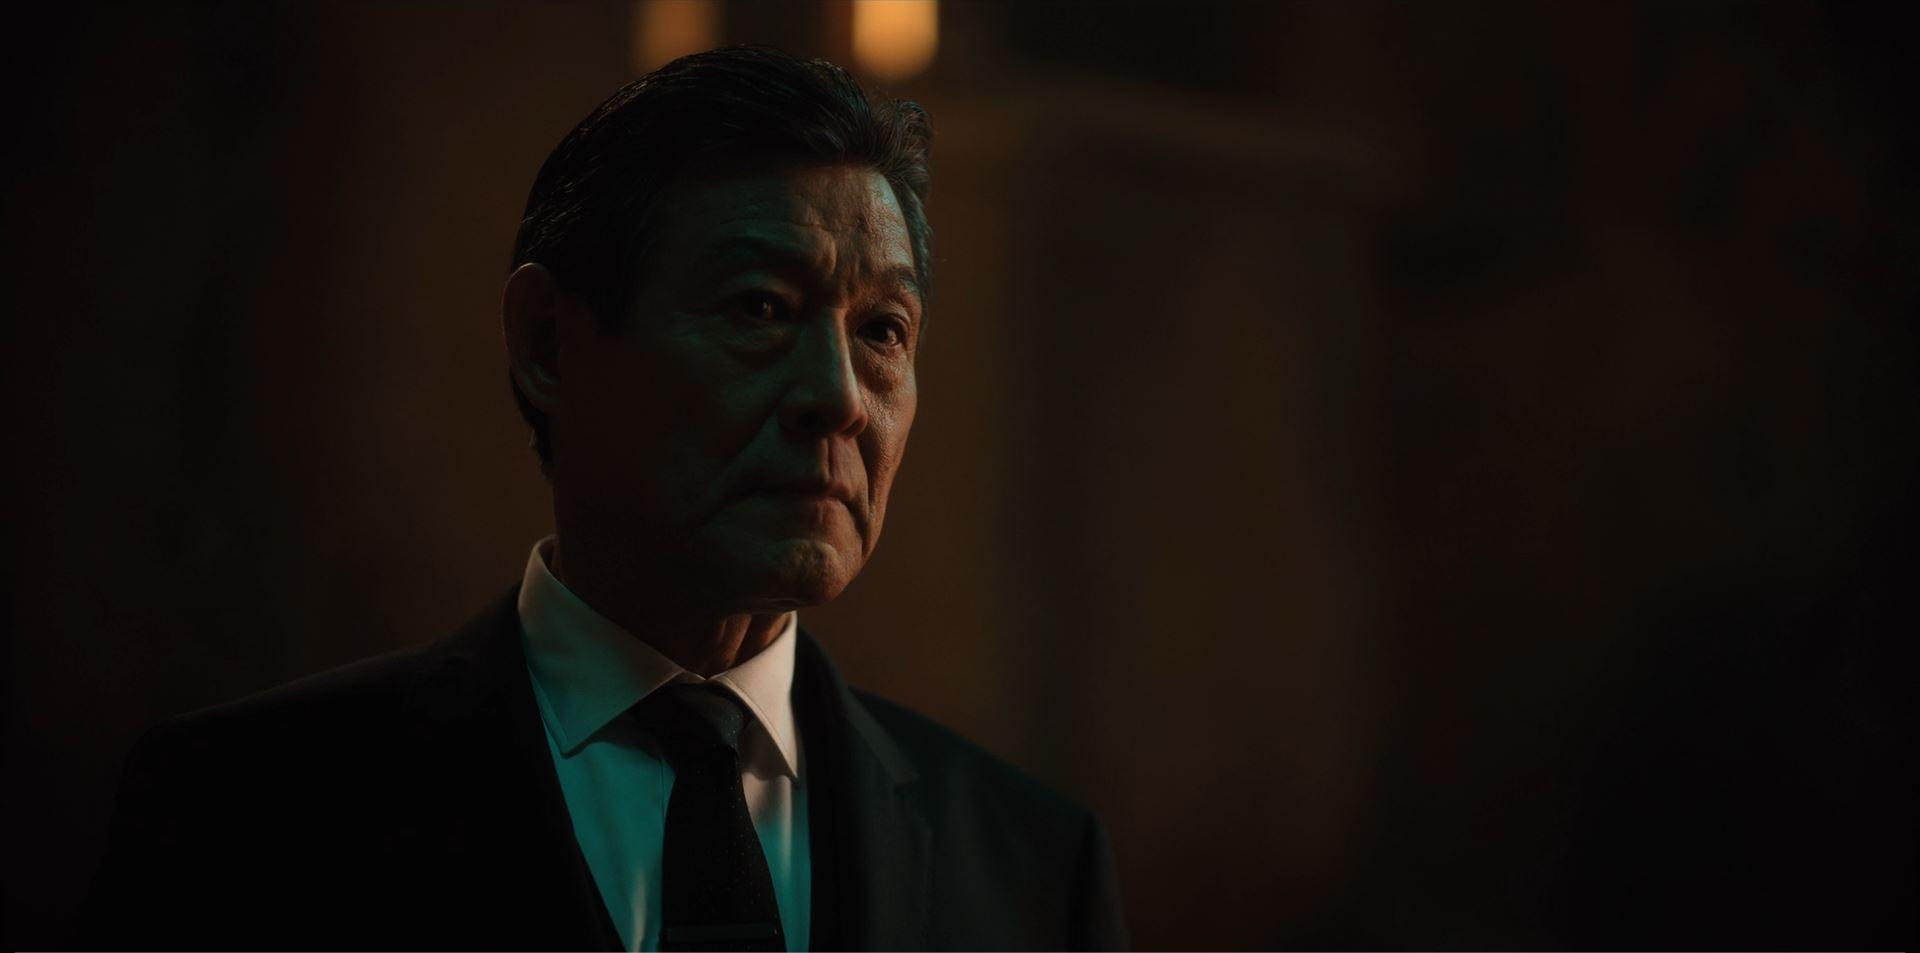 Altered Carbon Season 2 Review - Oyabun Hideko played by James Saito